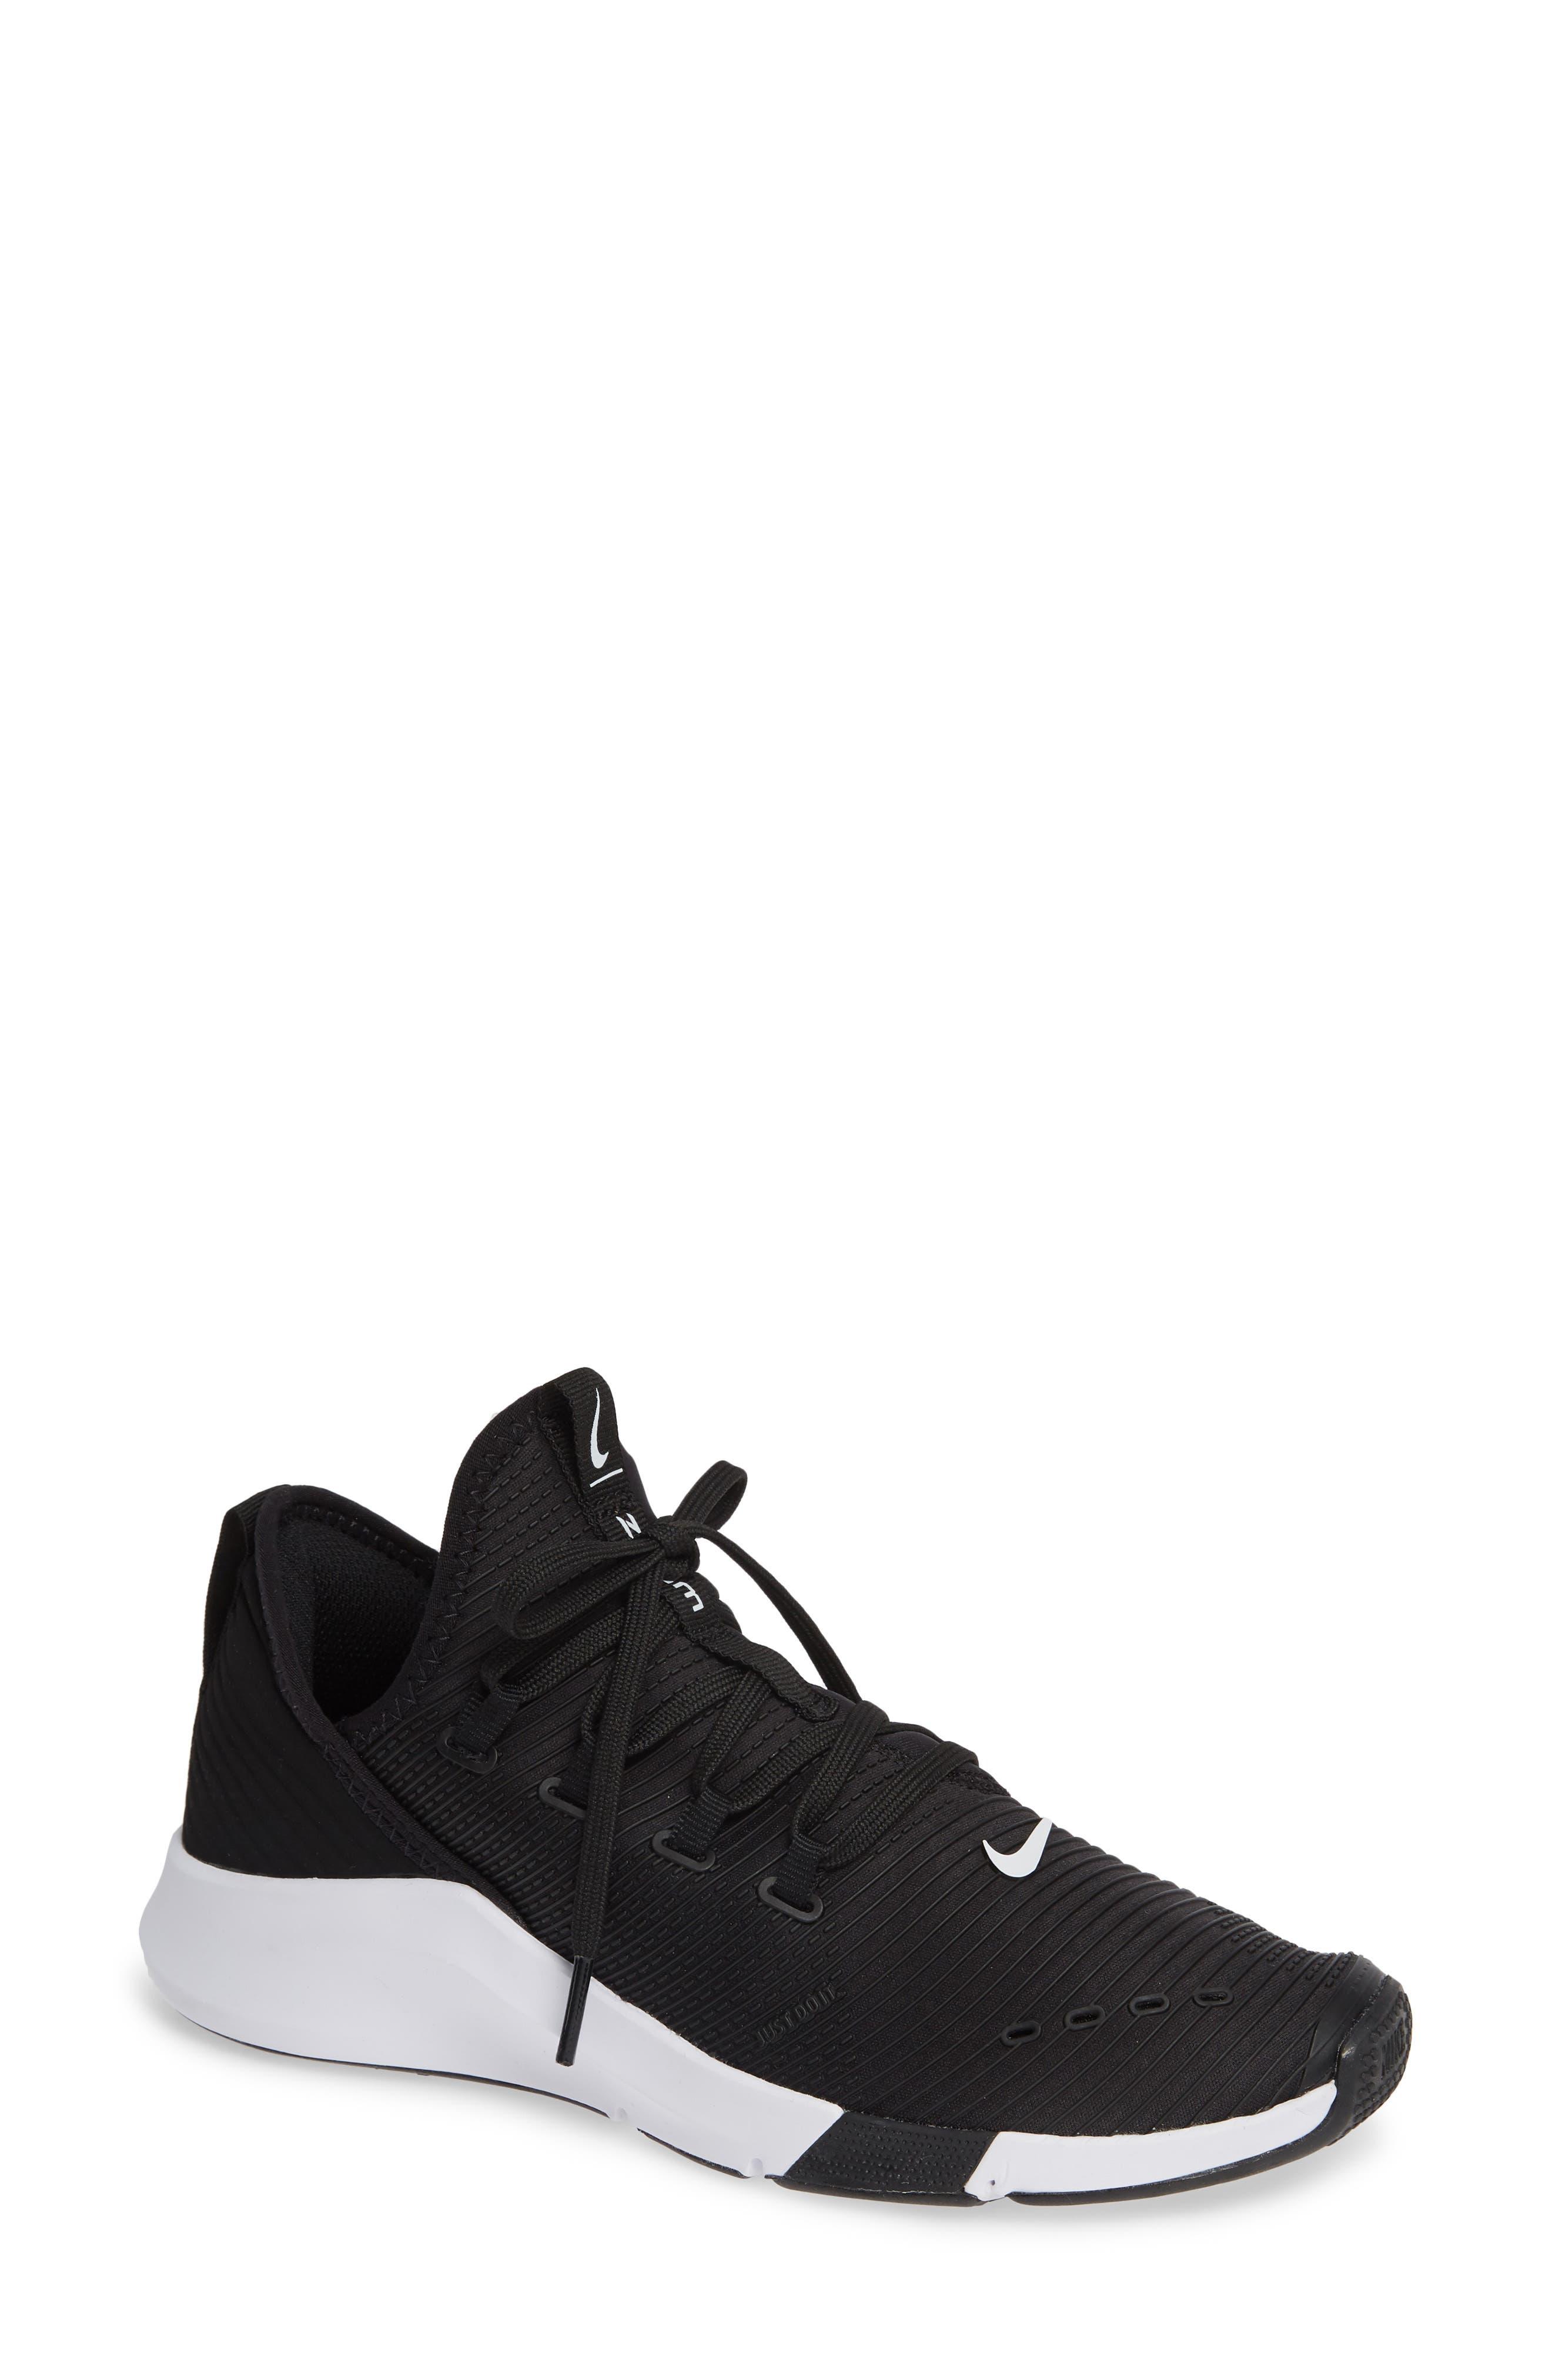 Nike Air Zoom Elevate Training Shoe